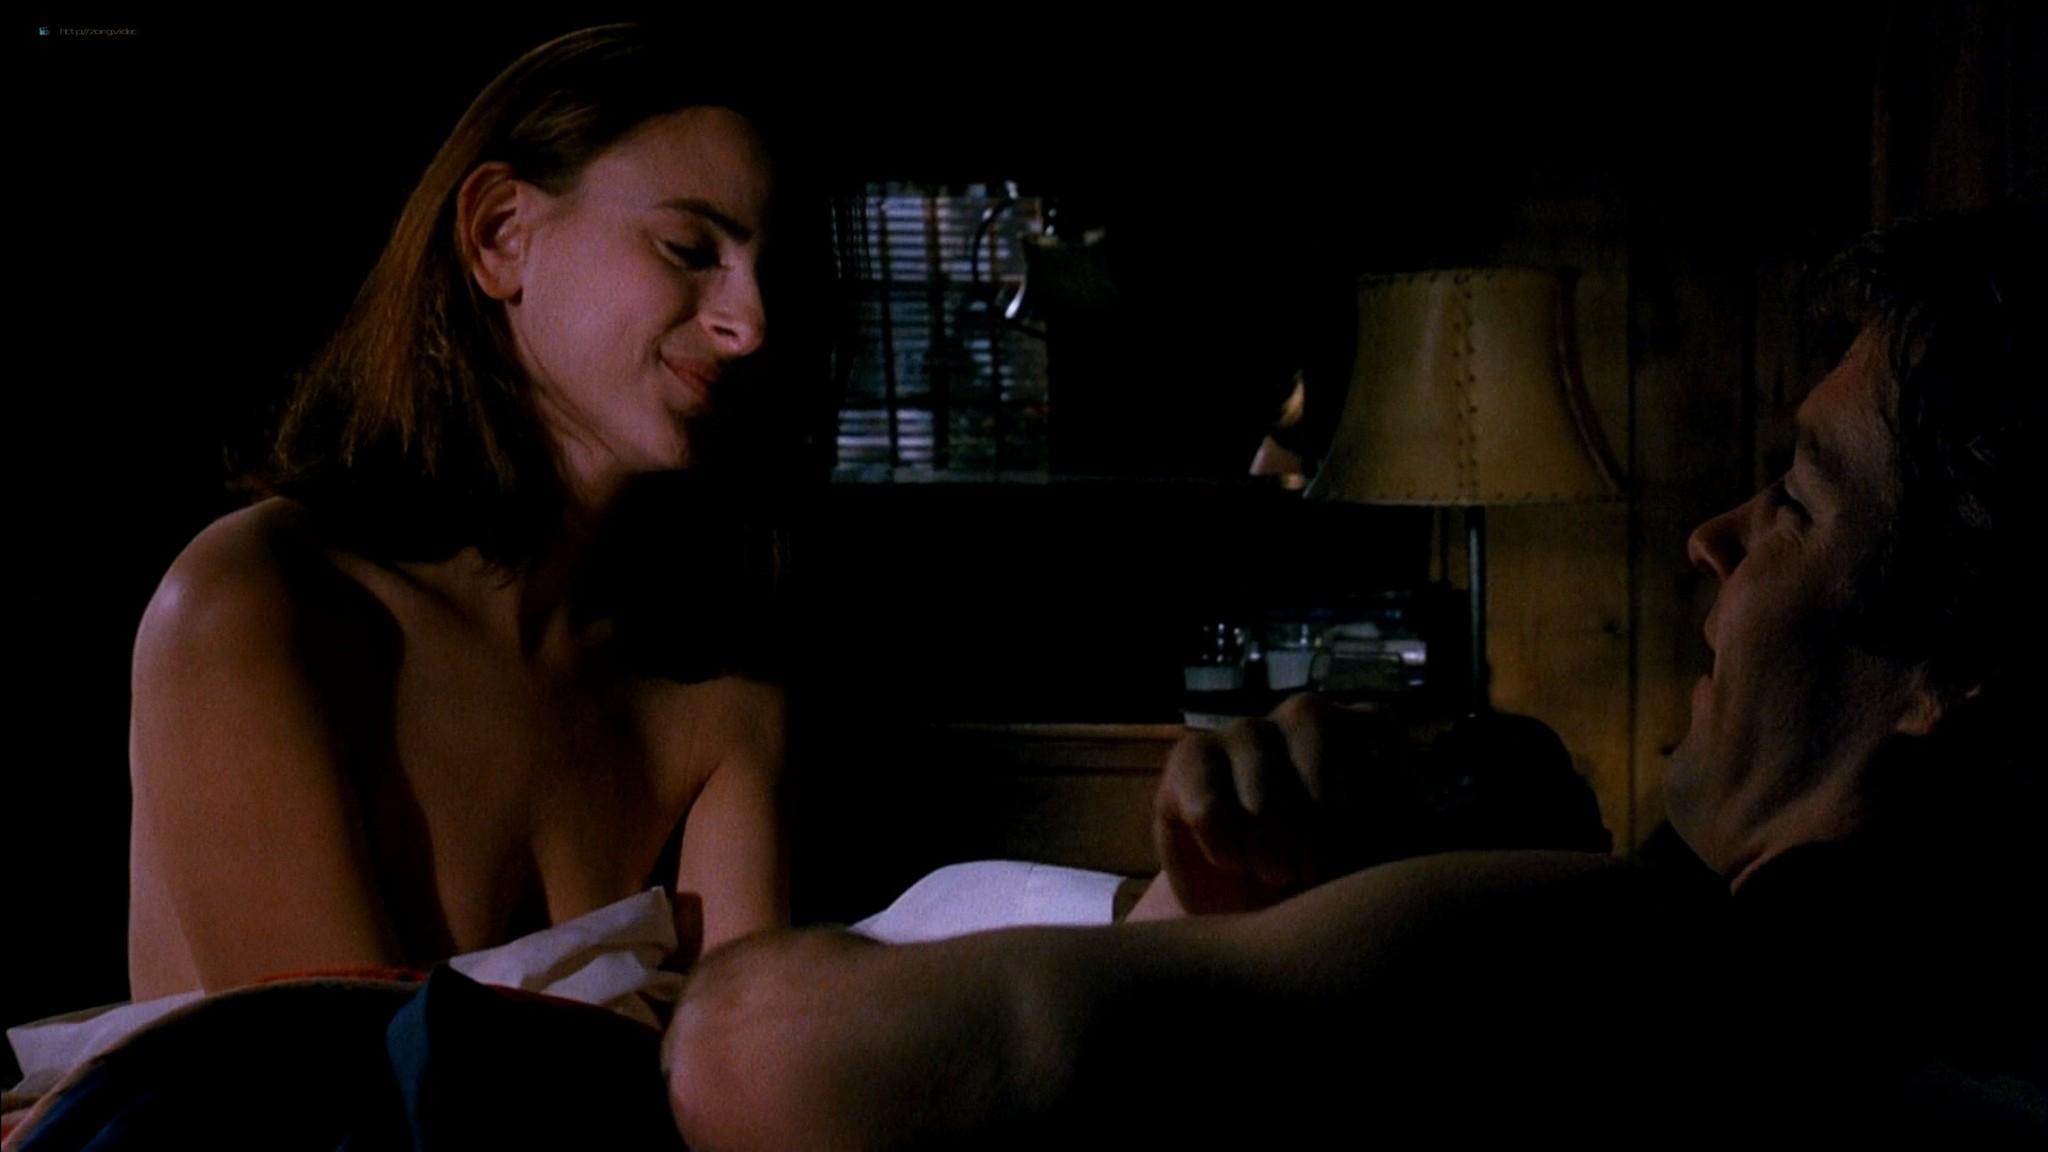 Marlee Matlin nude topless at the tub - Hear No Evil (1993) HD 1080p Web (3)